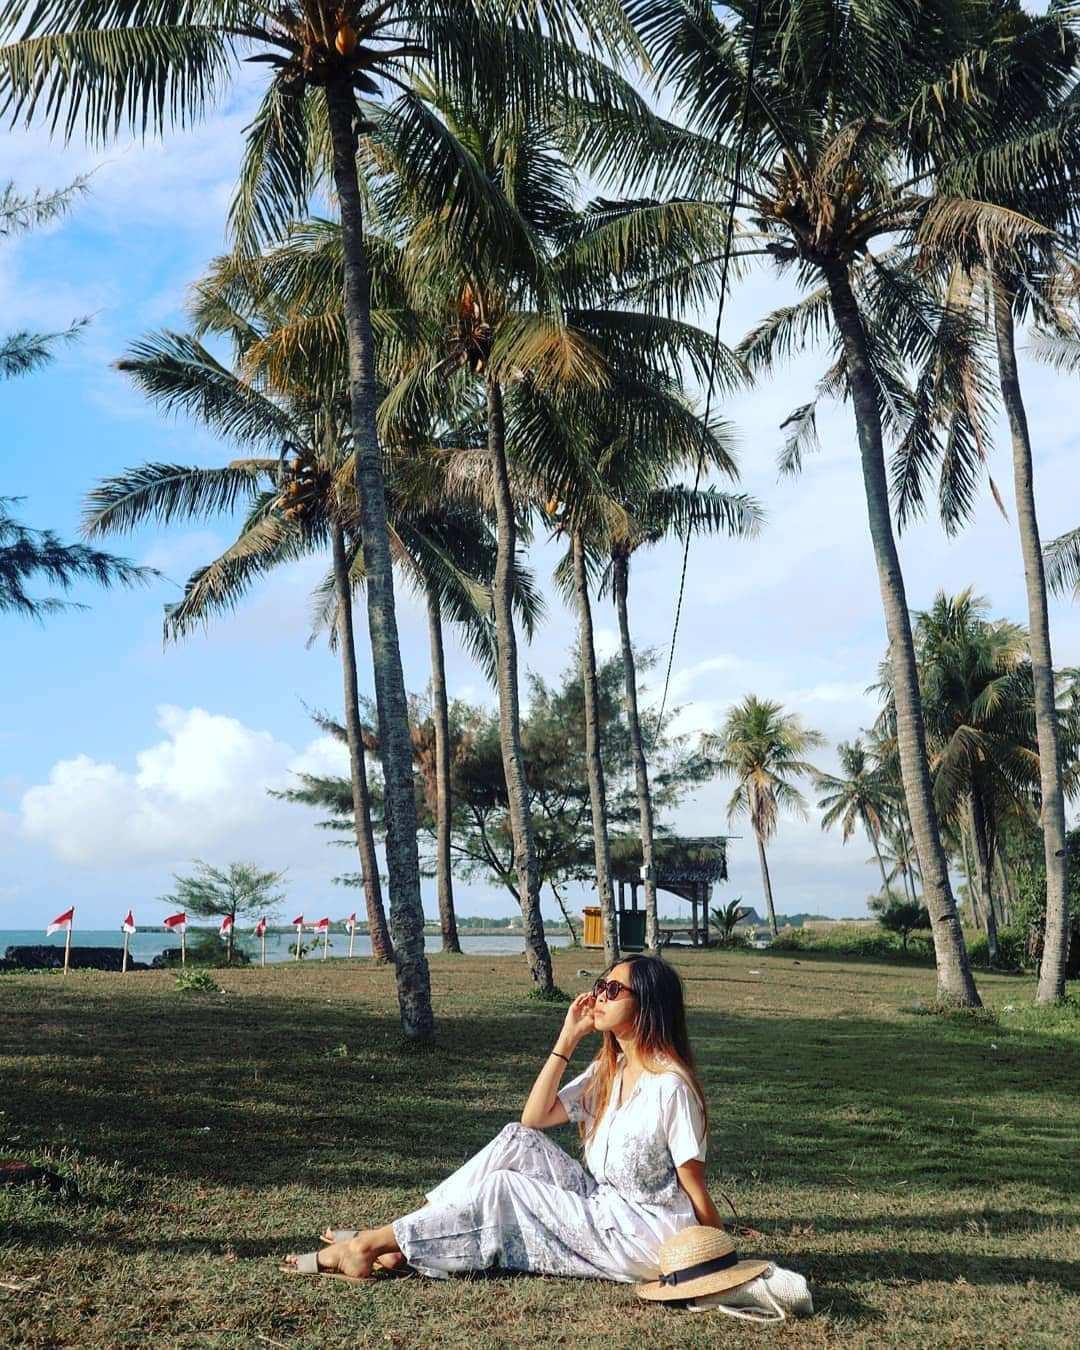 Berfoto Dengan Background Pohon kelapa di Pantai Cacalan Image From @yoana_pricielia